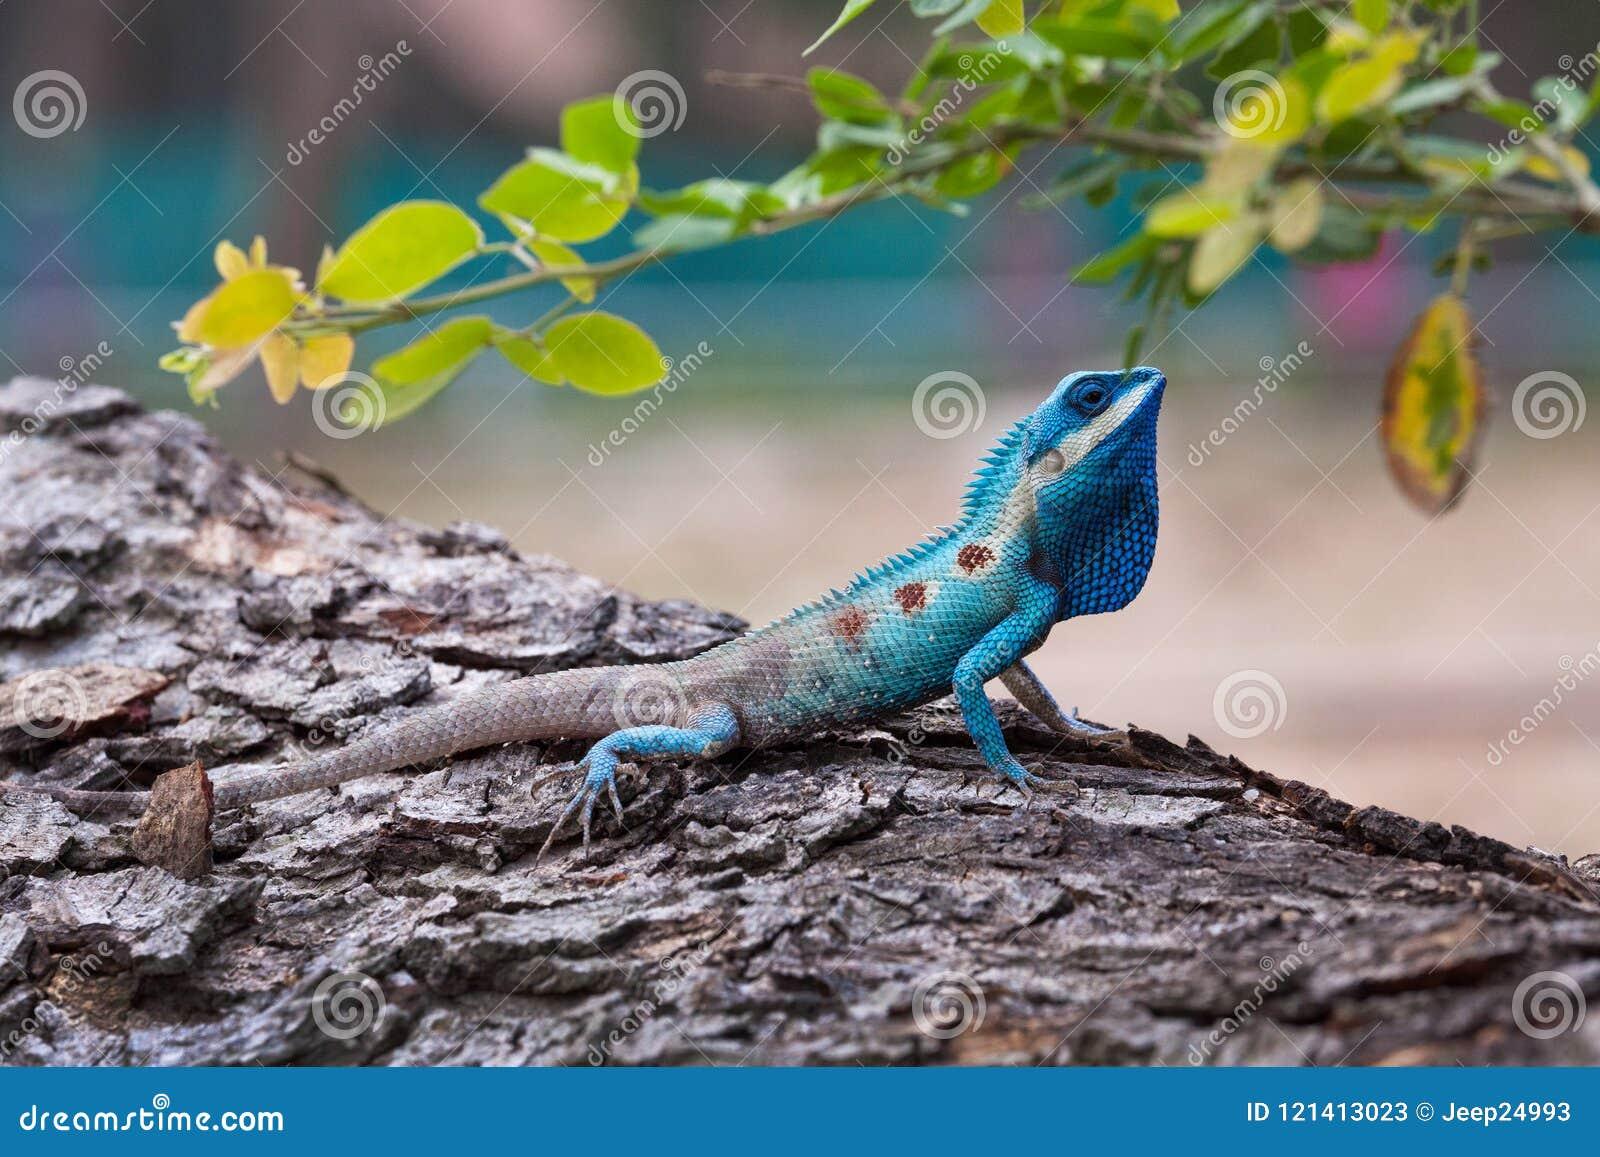 The portrait of wild lizard.